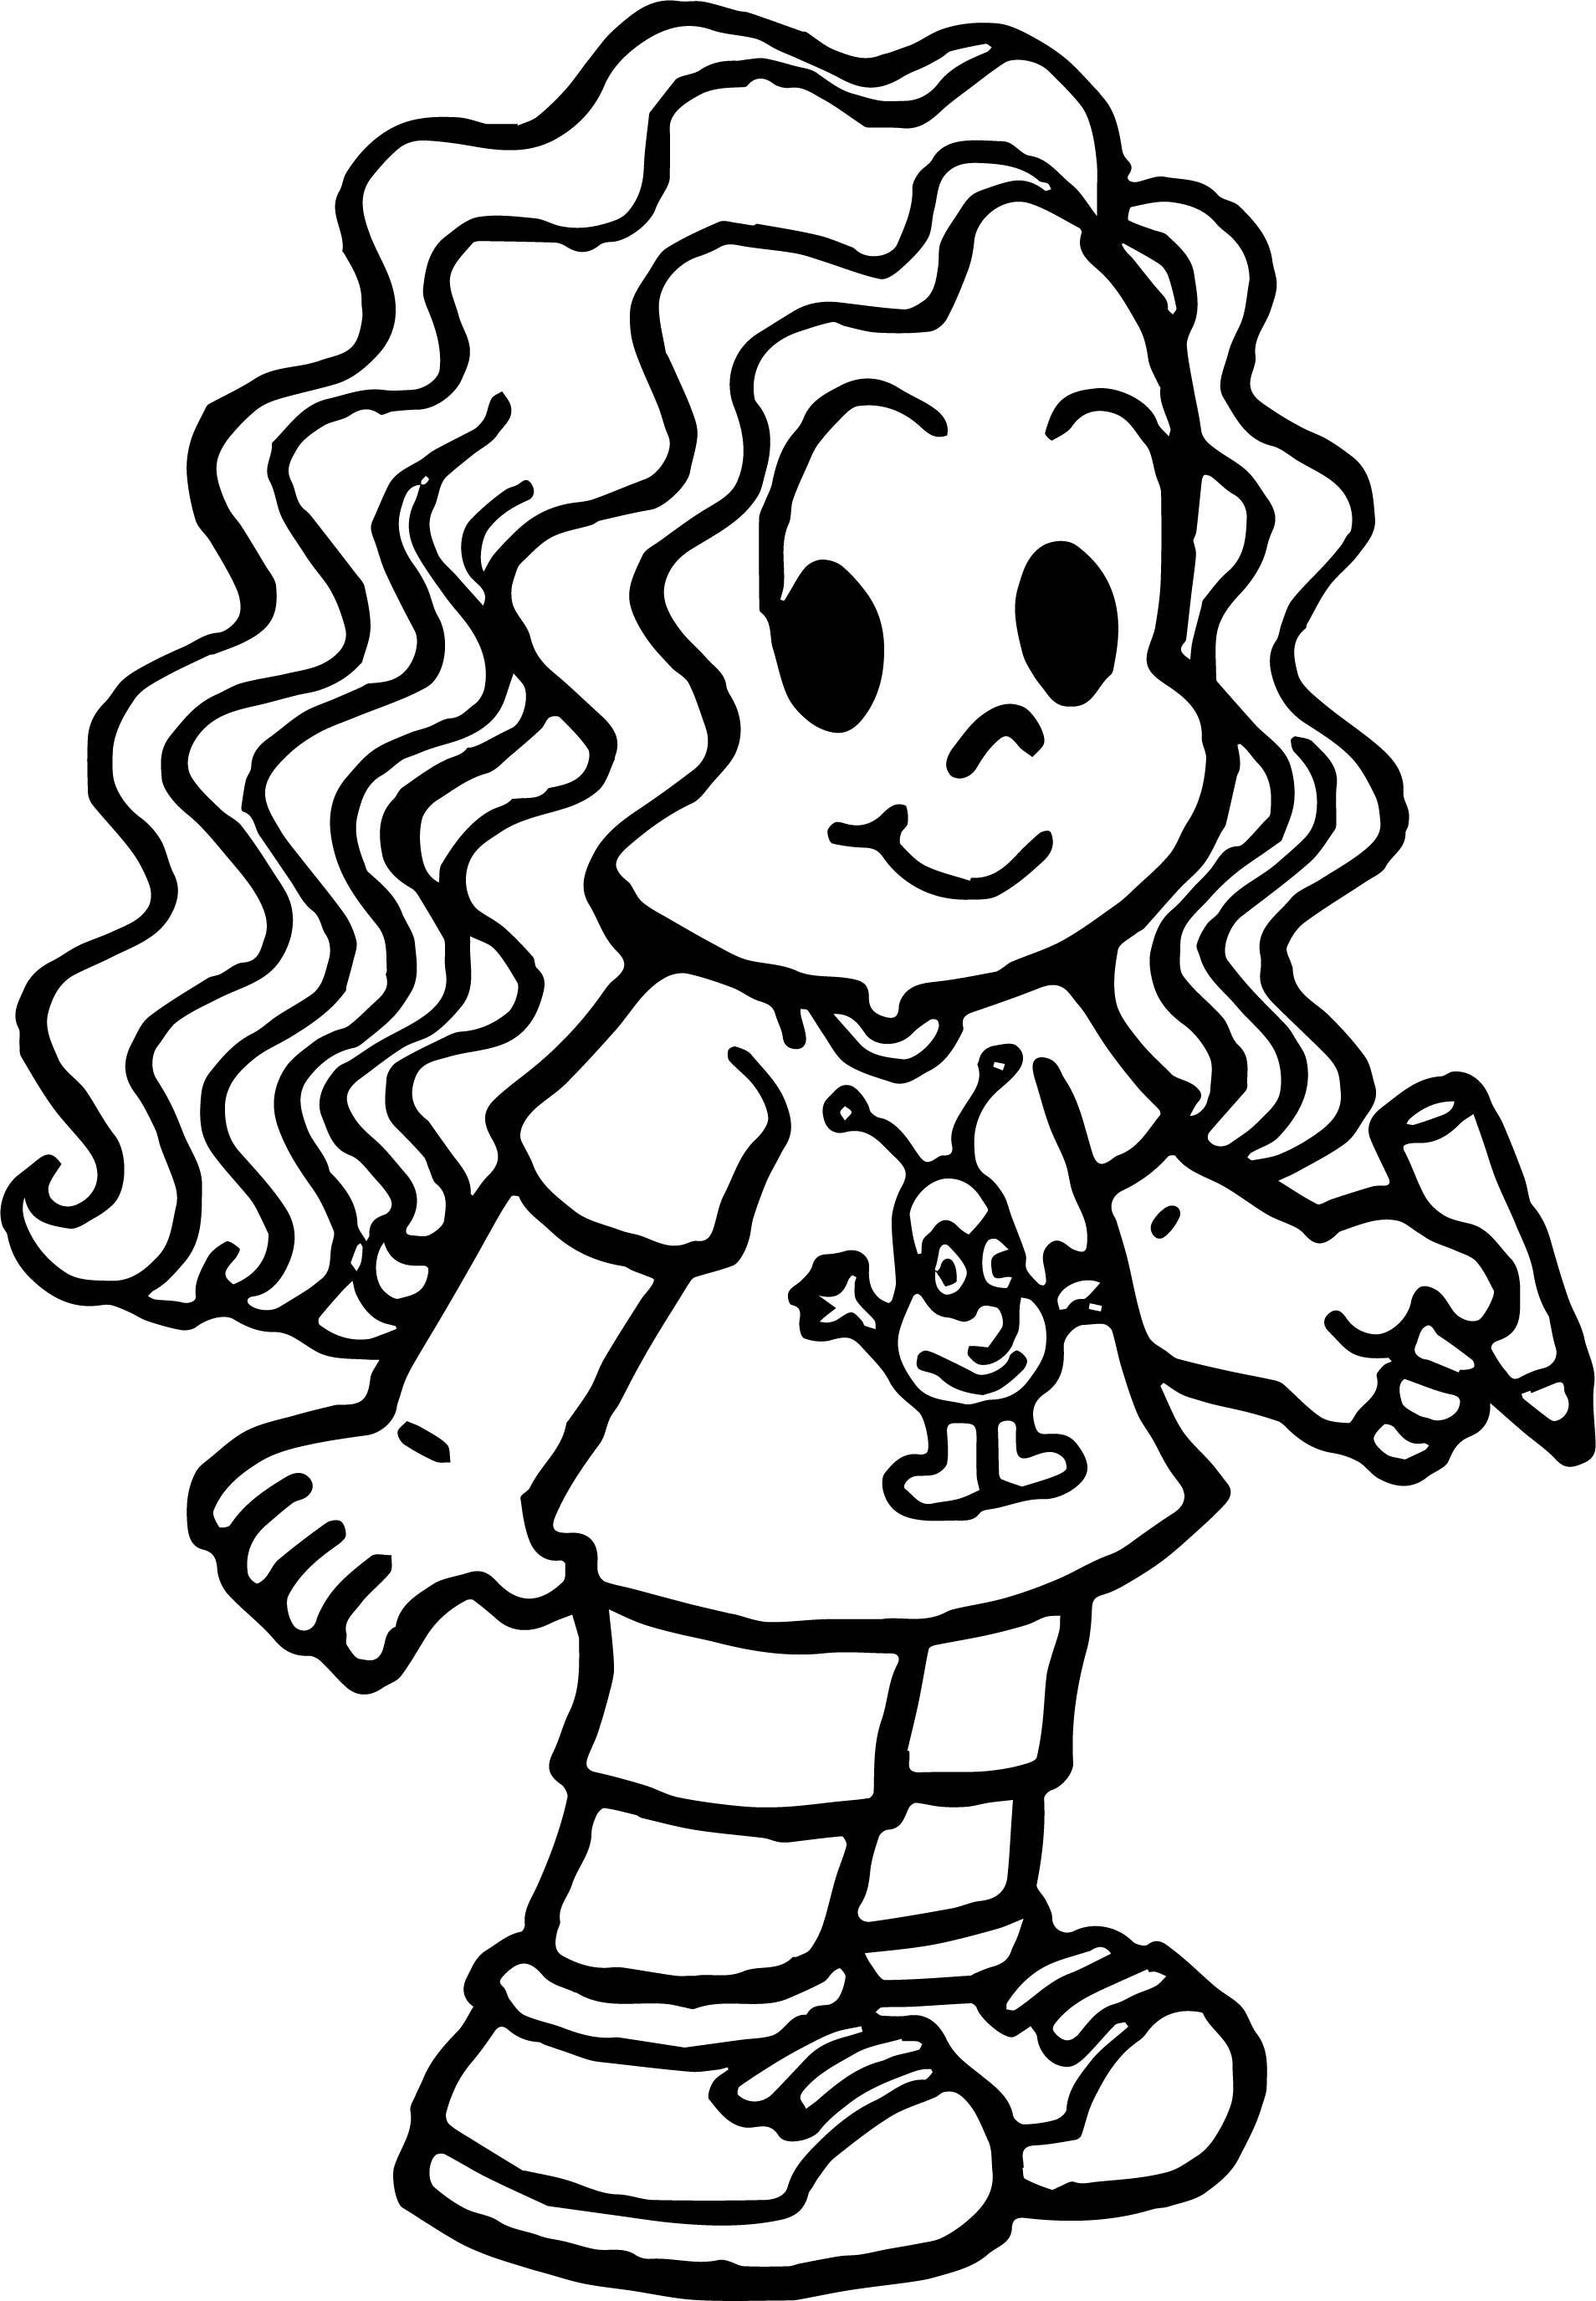 Marina Turma Da Monica Girl Coloring Page Wecoloringpage